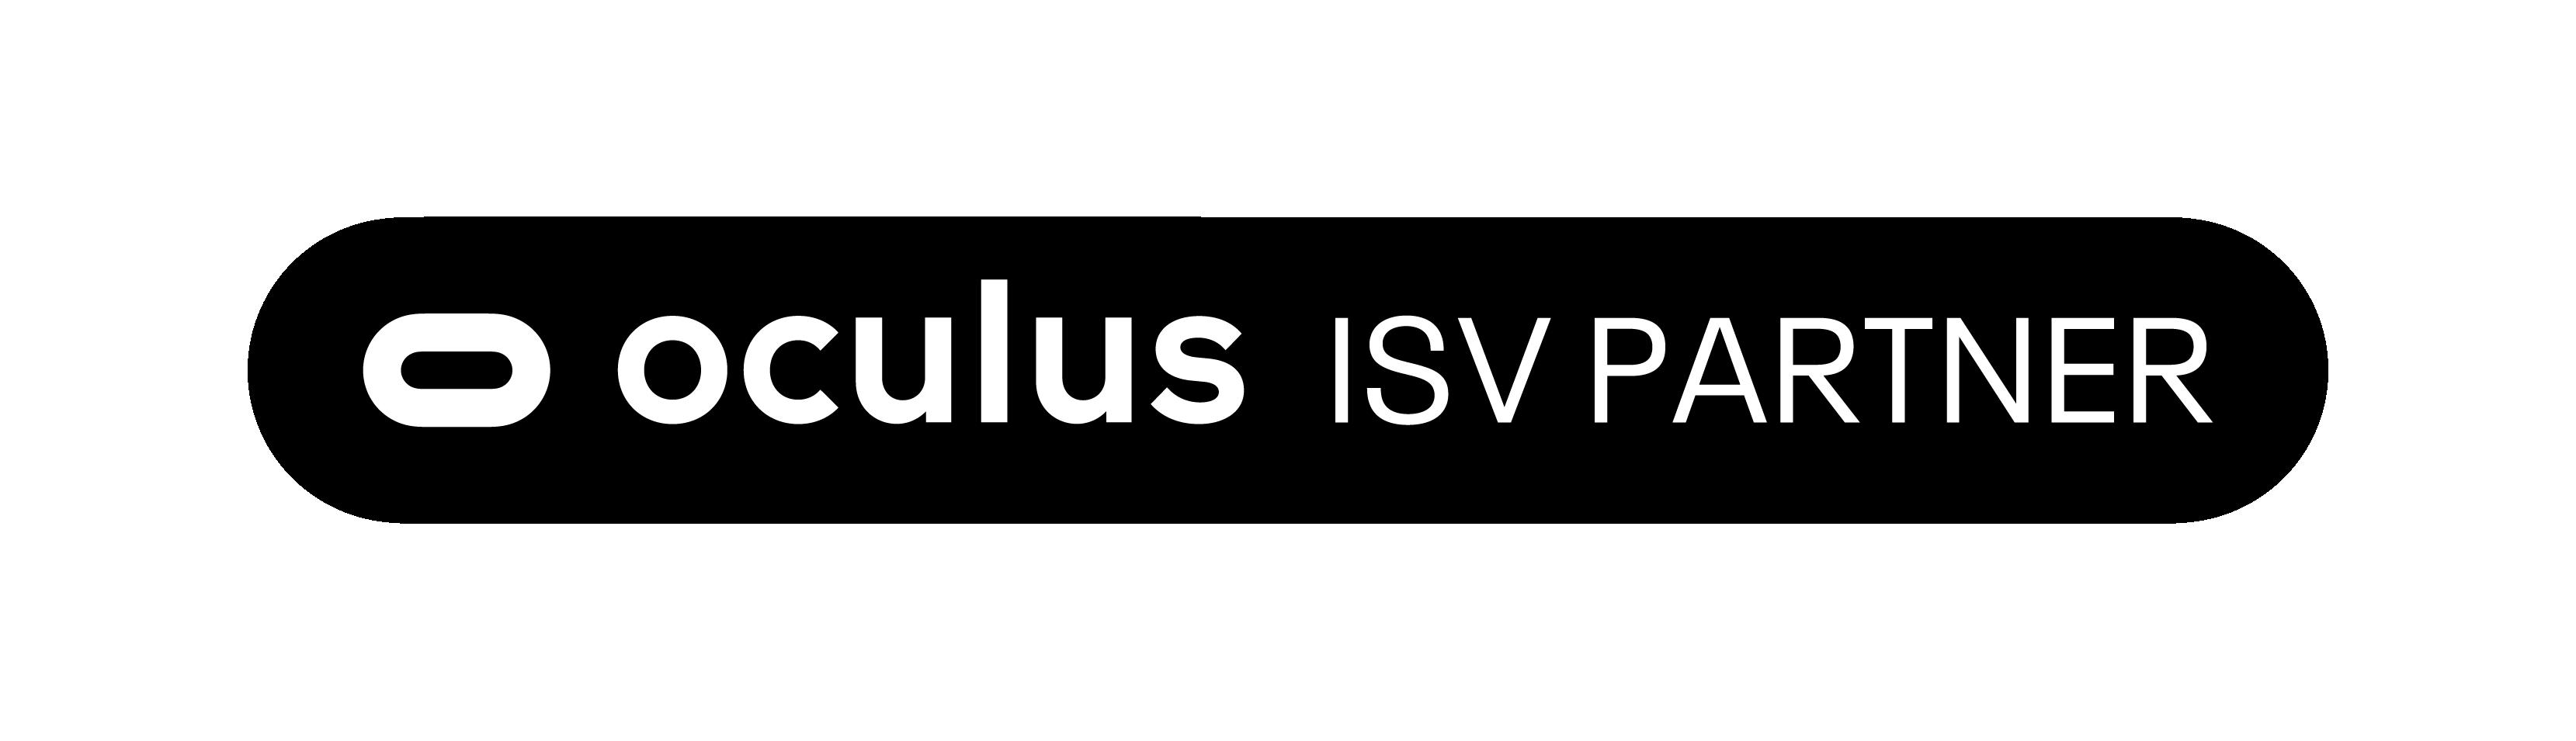 Oculus_ISV_Partner